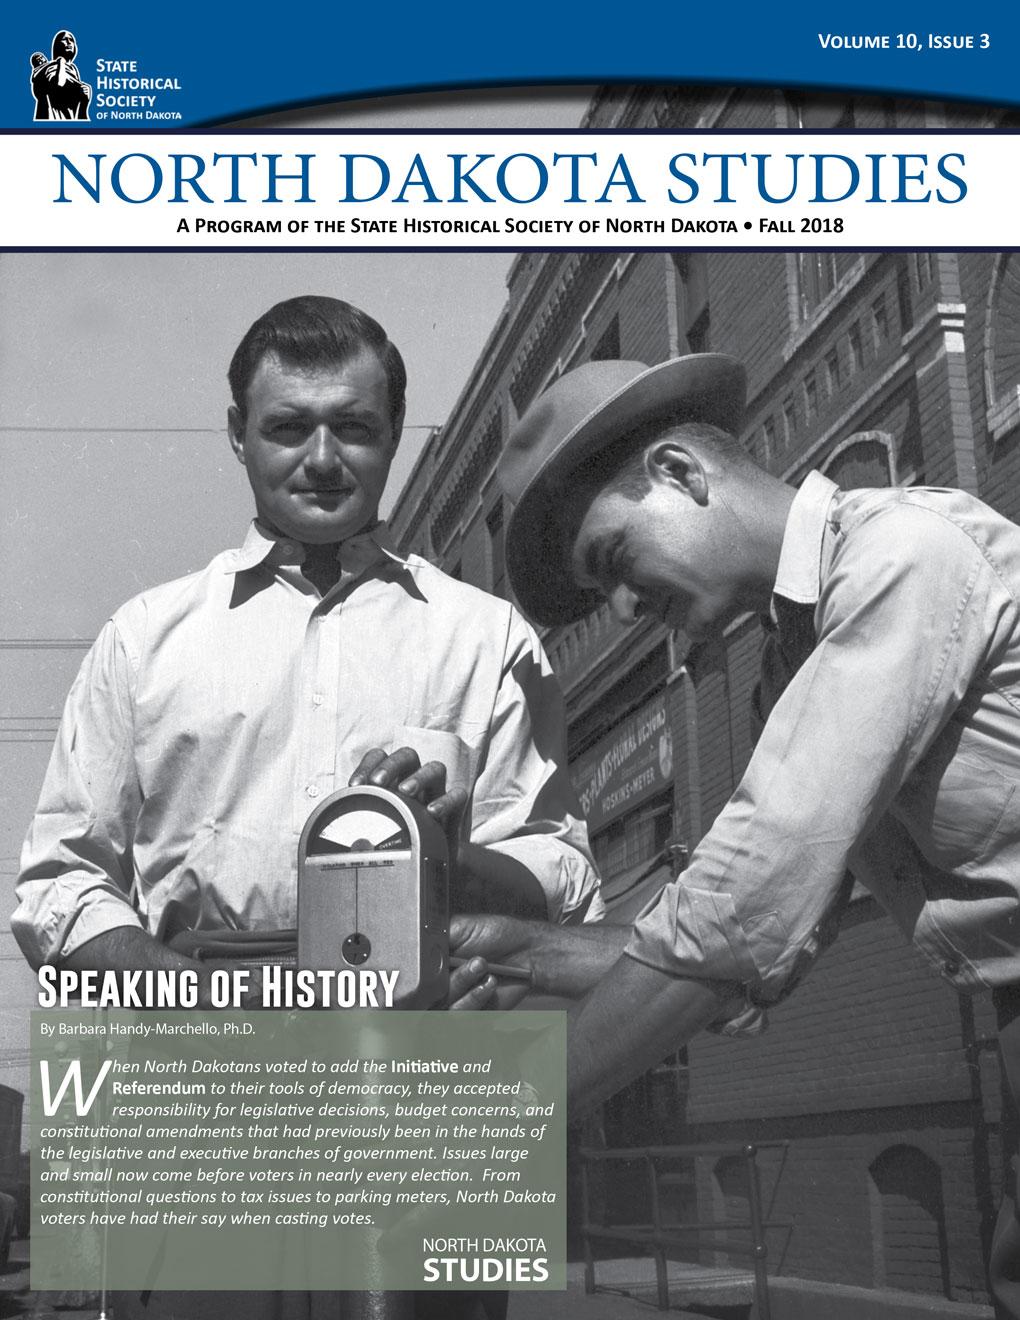 ND Studies newsletter cover - Volume 10-3 Fall 2018